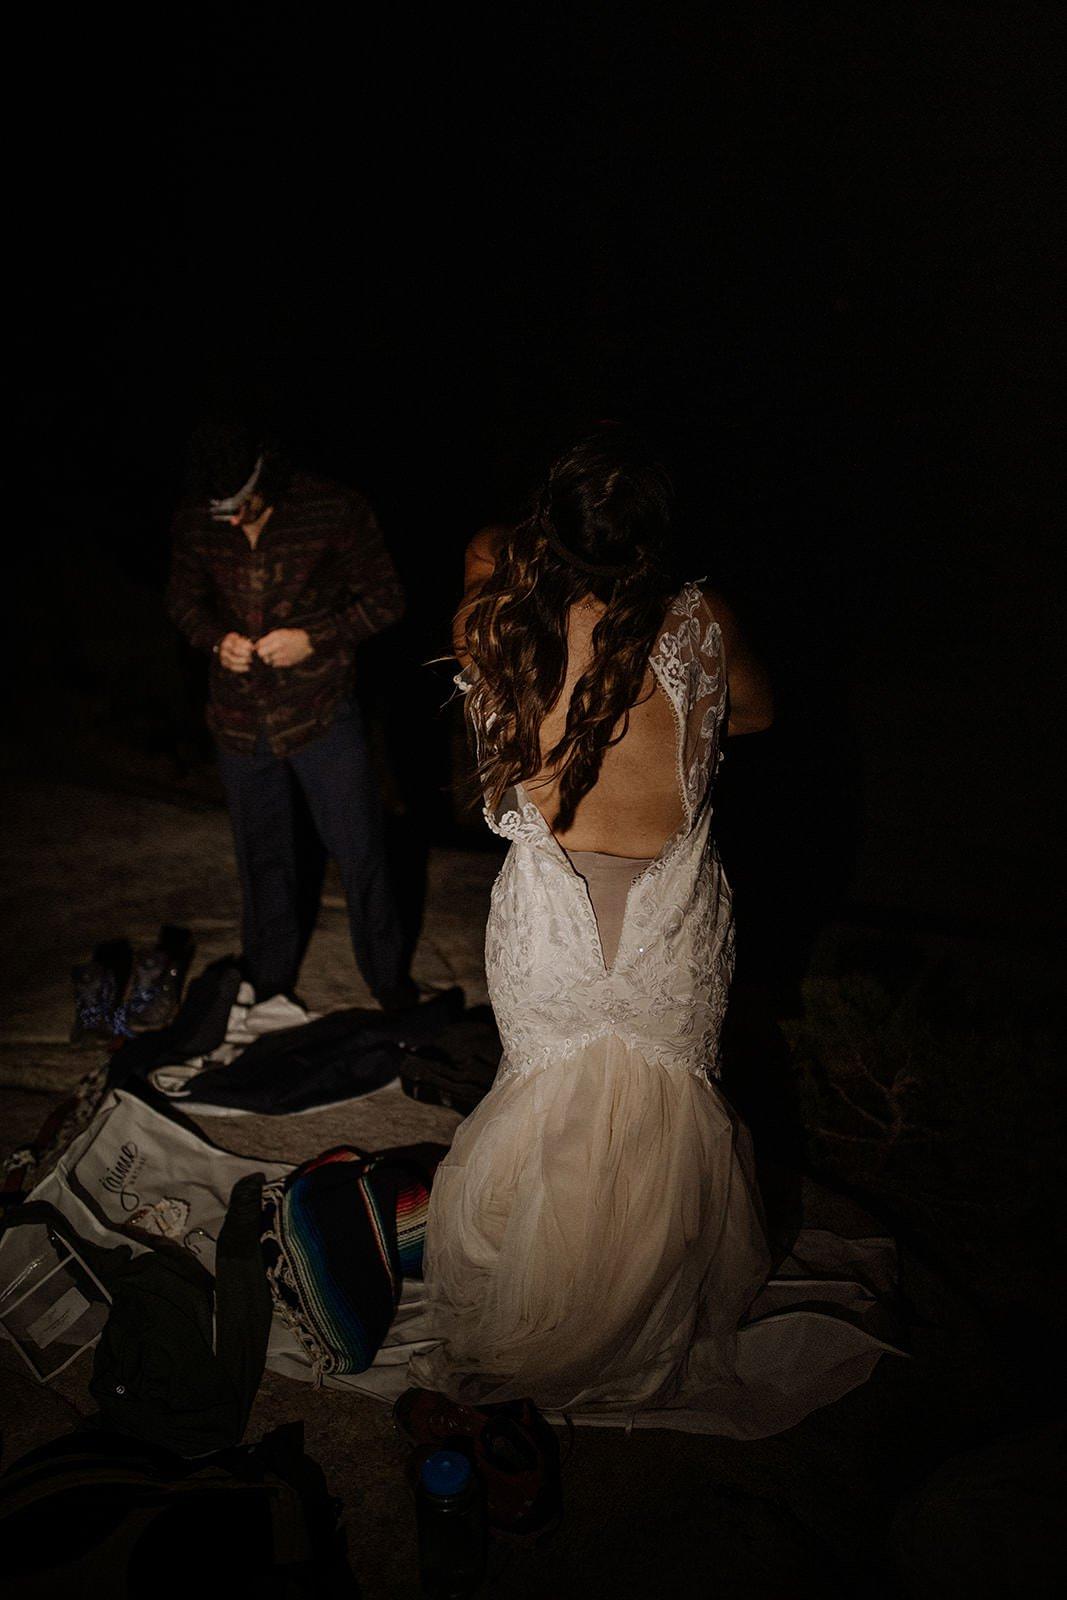 getting dressed during wedding adventure